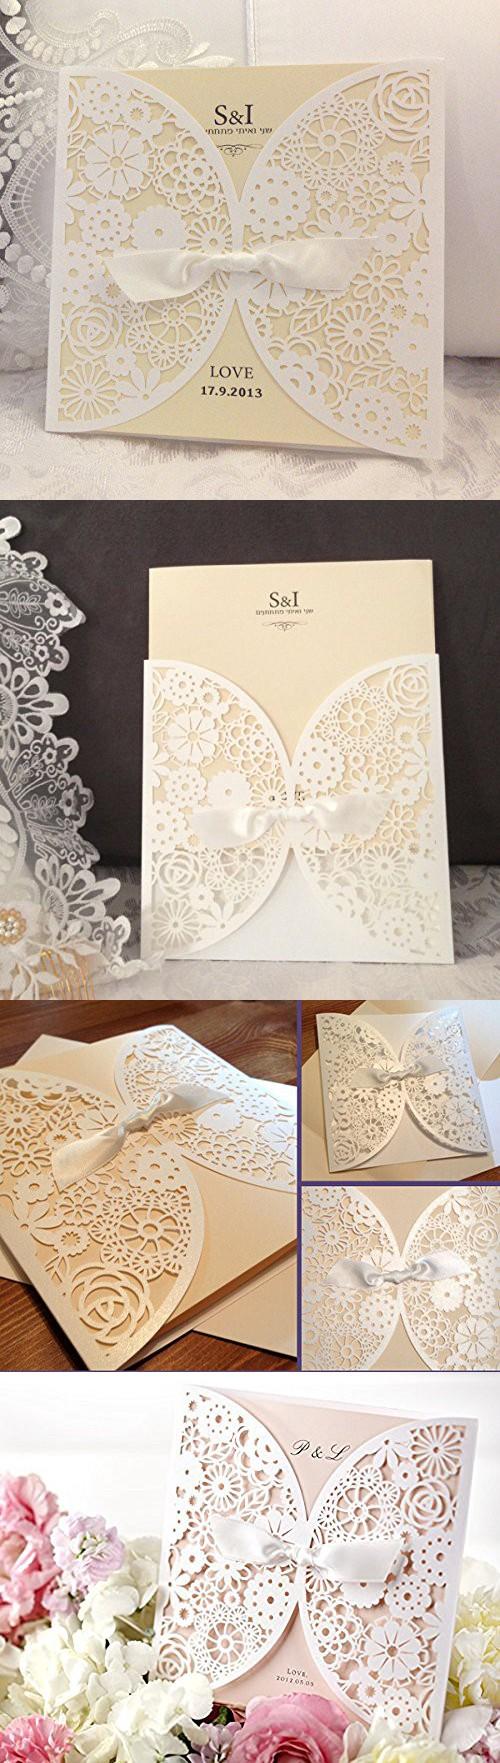 DIY Laser Cut Lace Vintage Flower Wedding Invitation Template Invite ...